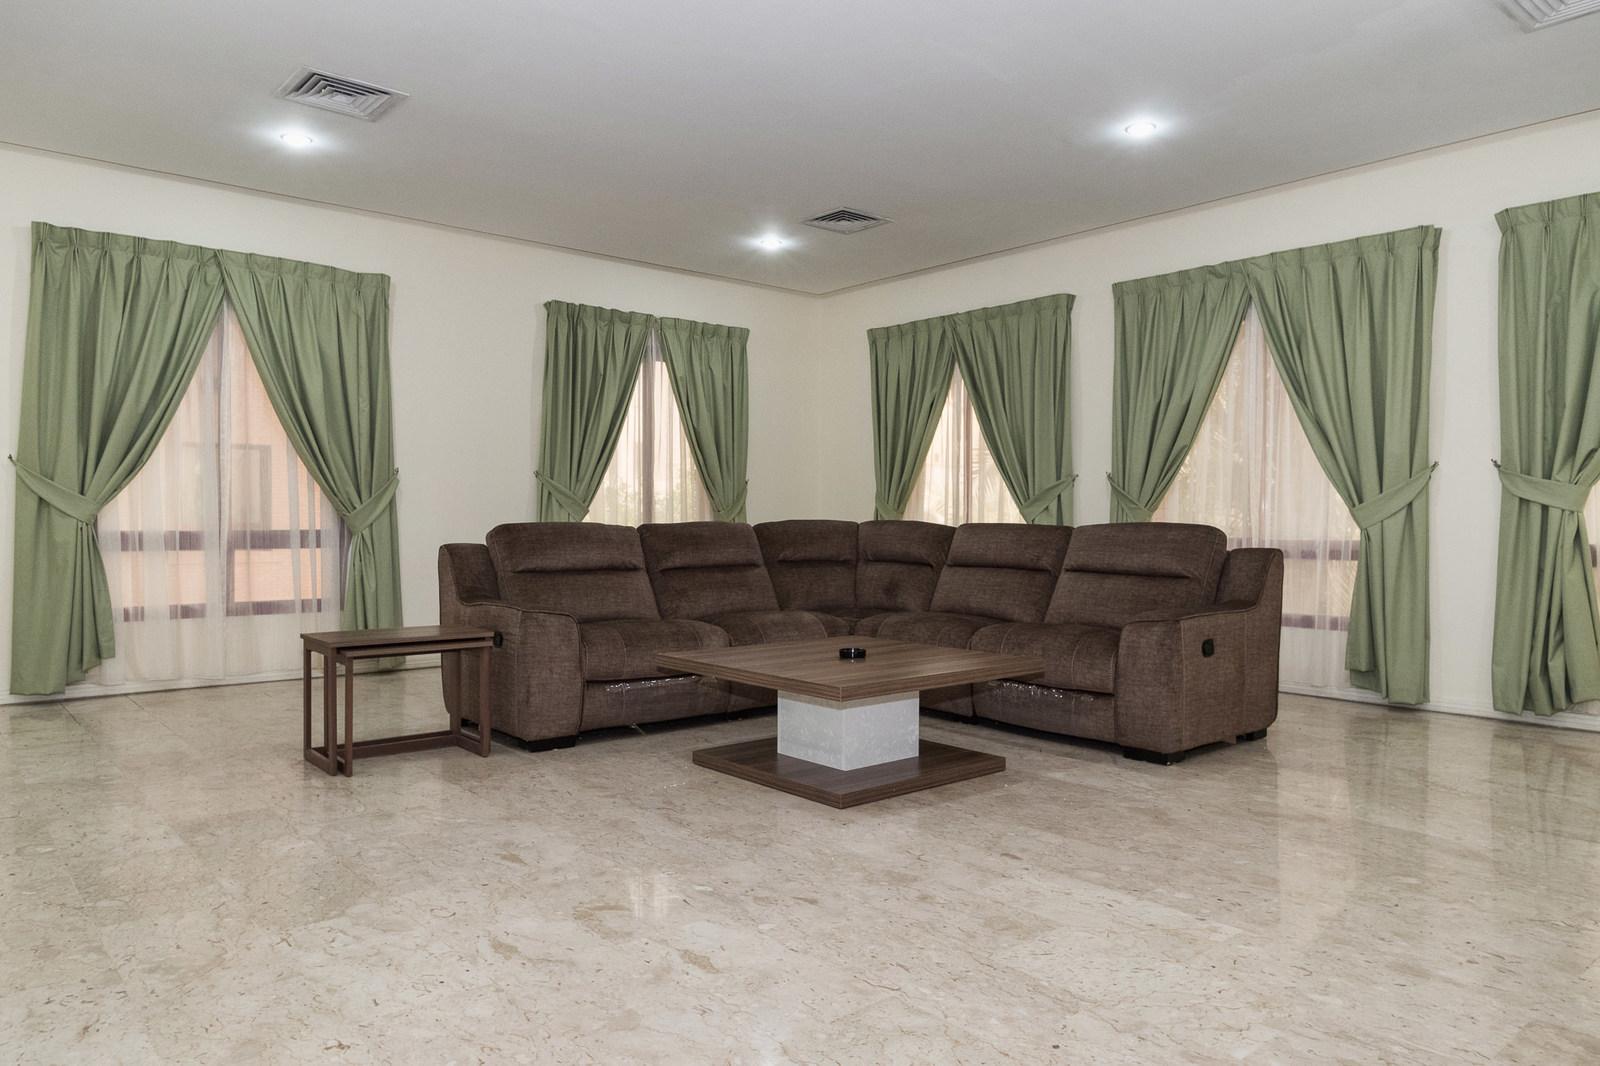 Salwa – very spacious, furnished, three bedroom apartment w/pool